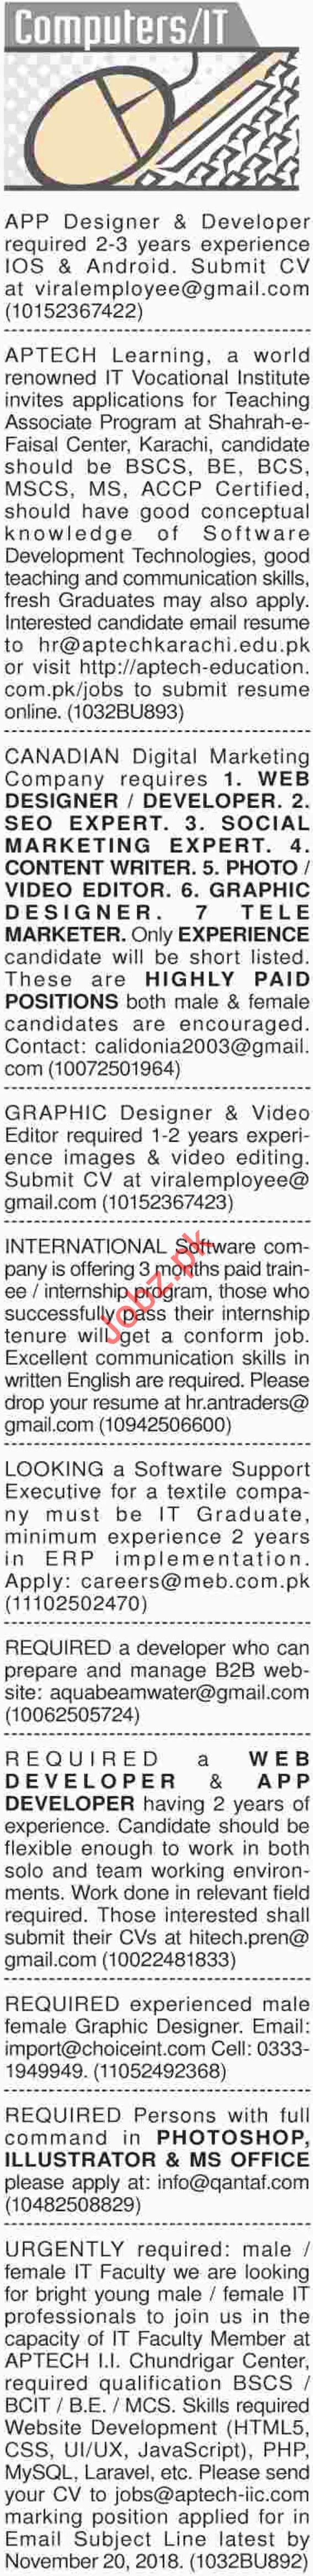 Dawn Sunday Newspaper Classified Computers & IT Ads 2018